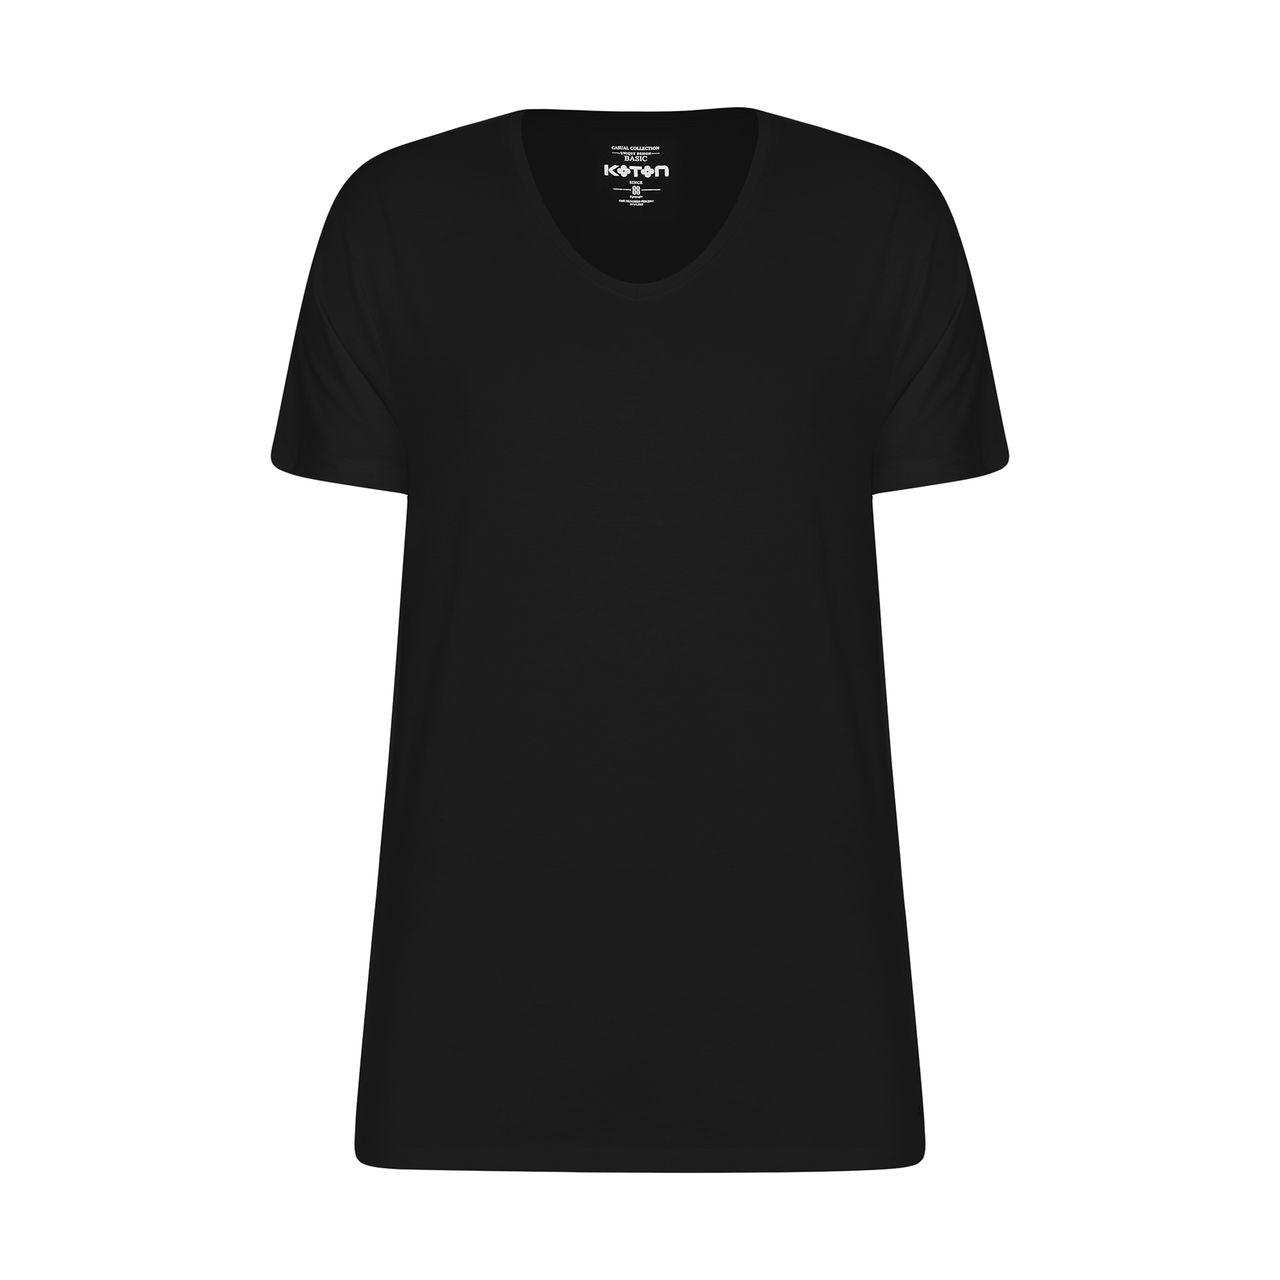 تیشرت آستین کوتاه مردانه کوتون مدل 8YAM15139LK-999